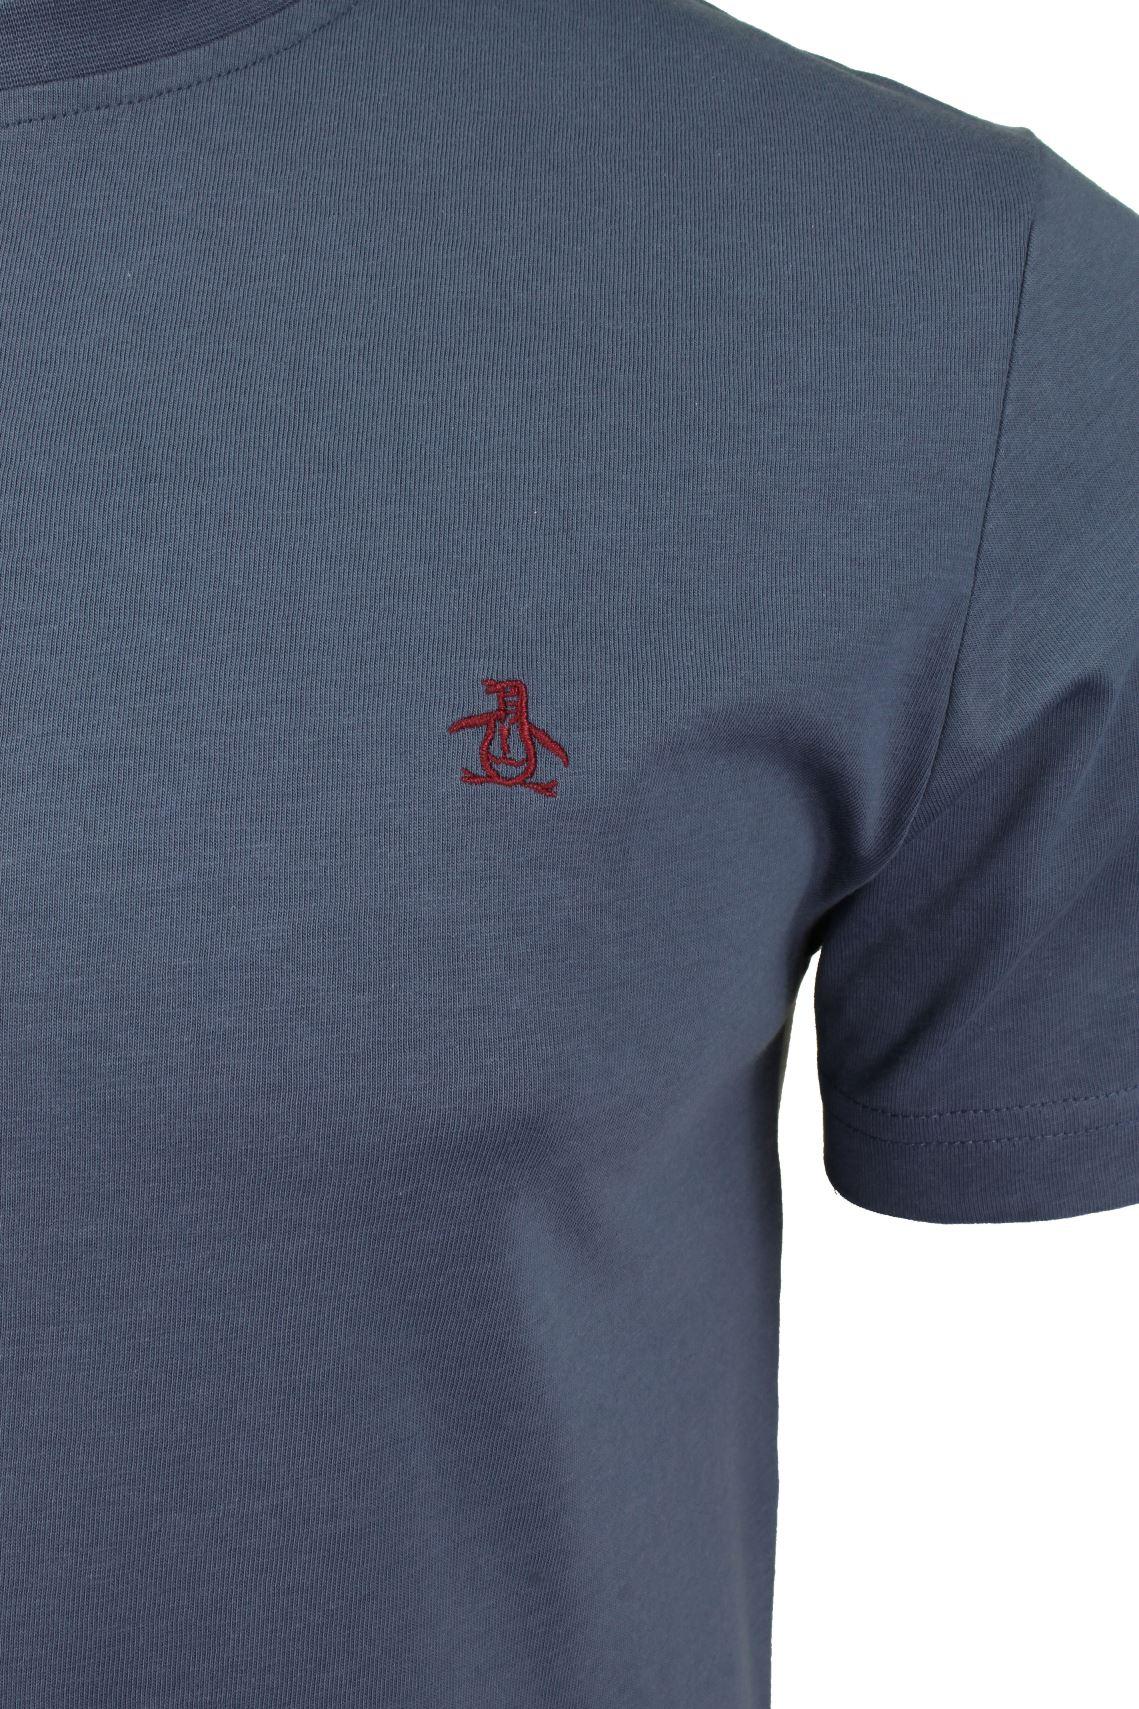 Mens-T-Shirt-by-Original-Penguin-Crew-Neck-Short-Sleeved thumbnail 55